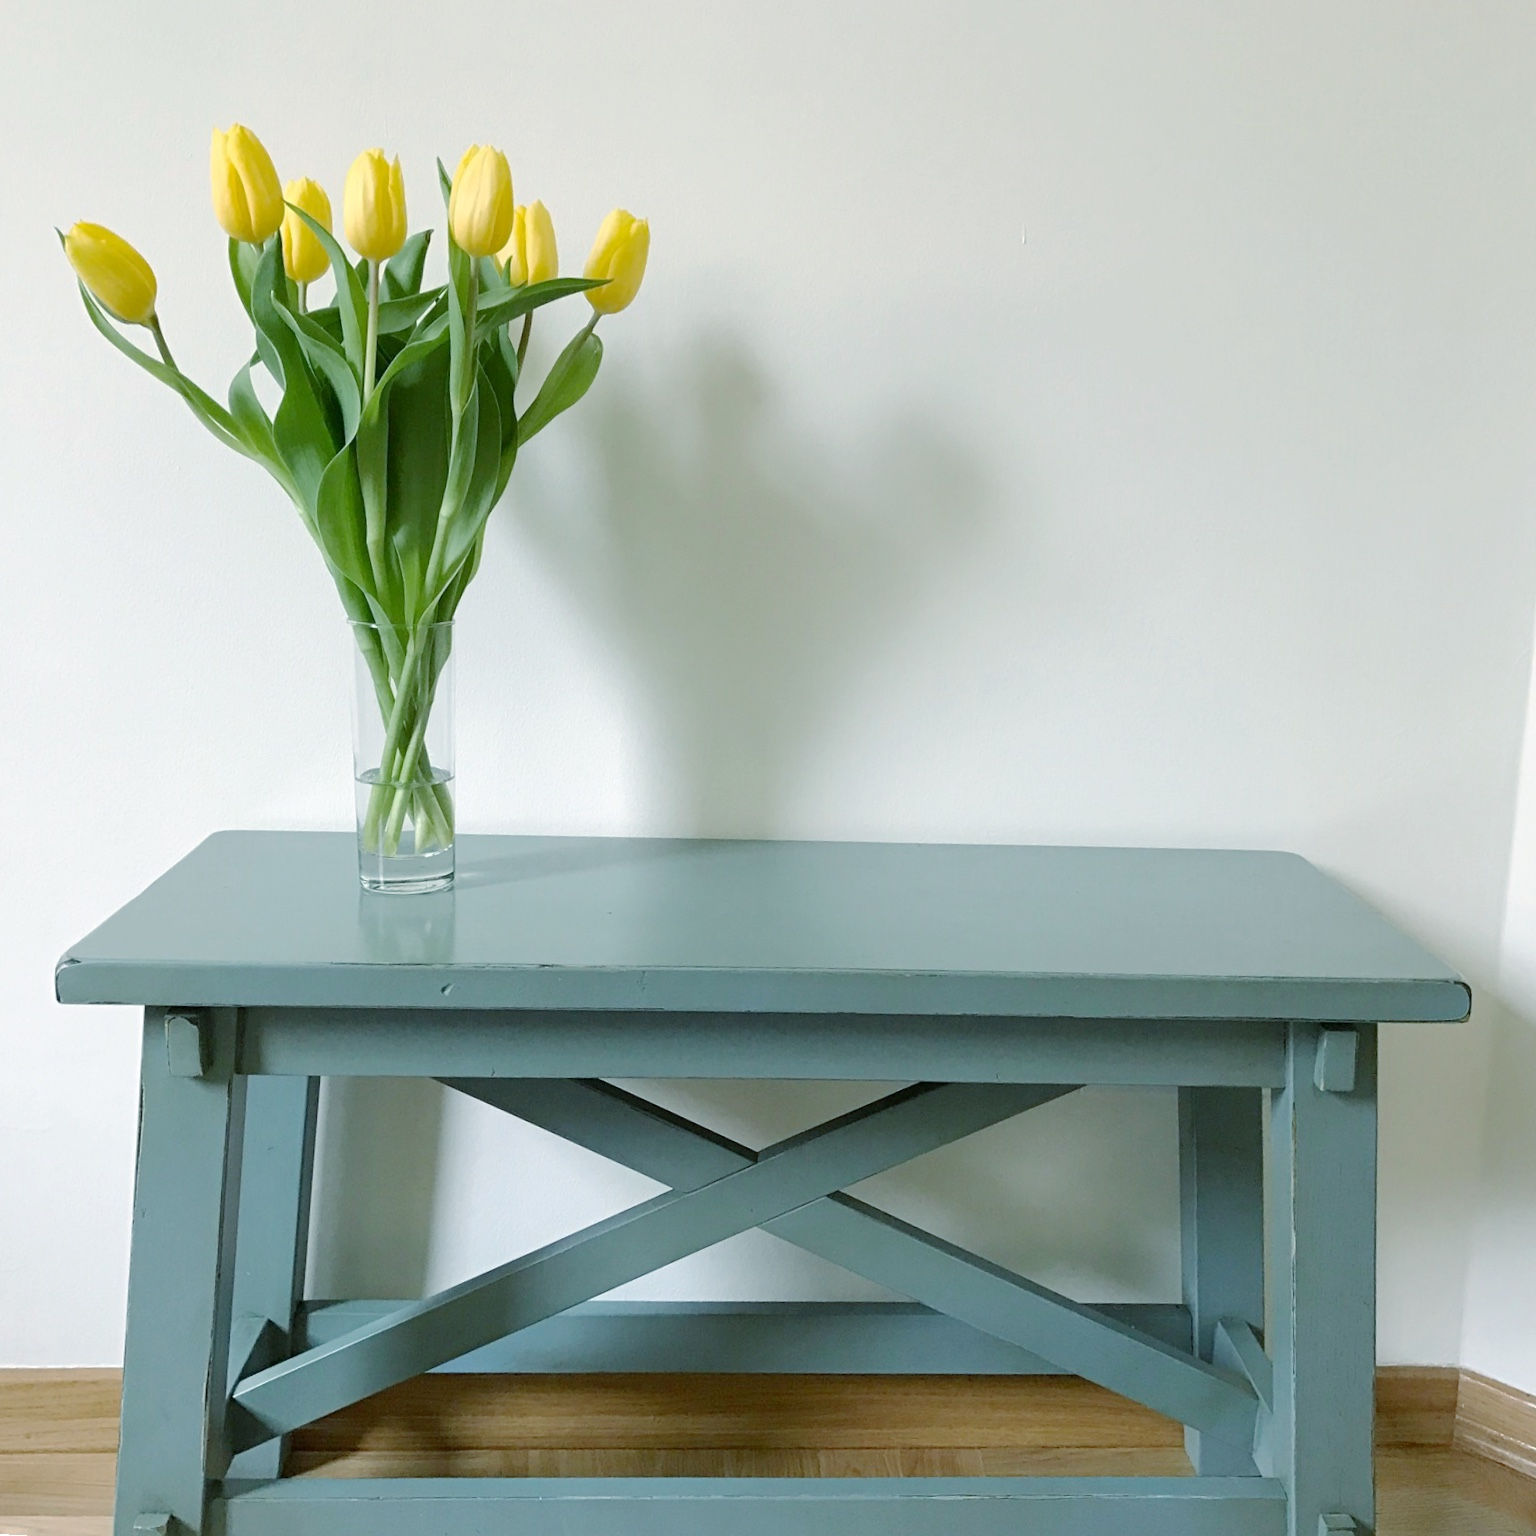 tulips-on-blue-bench.jpg